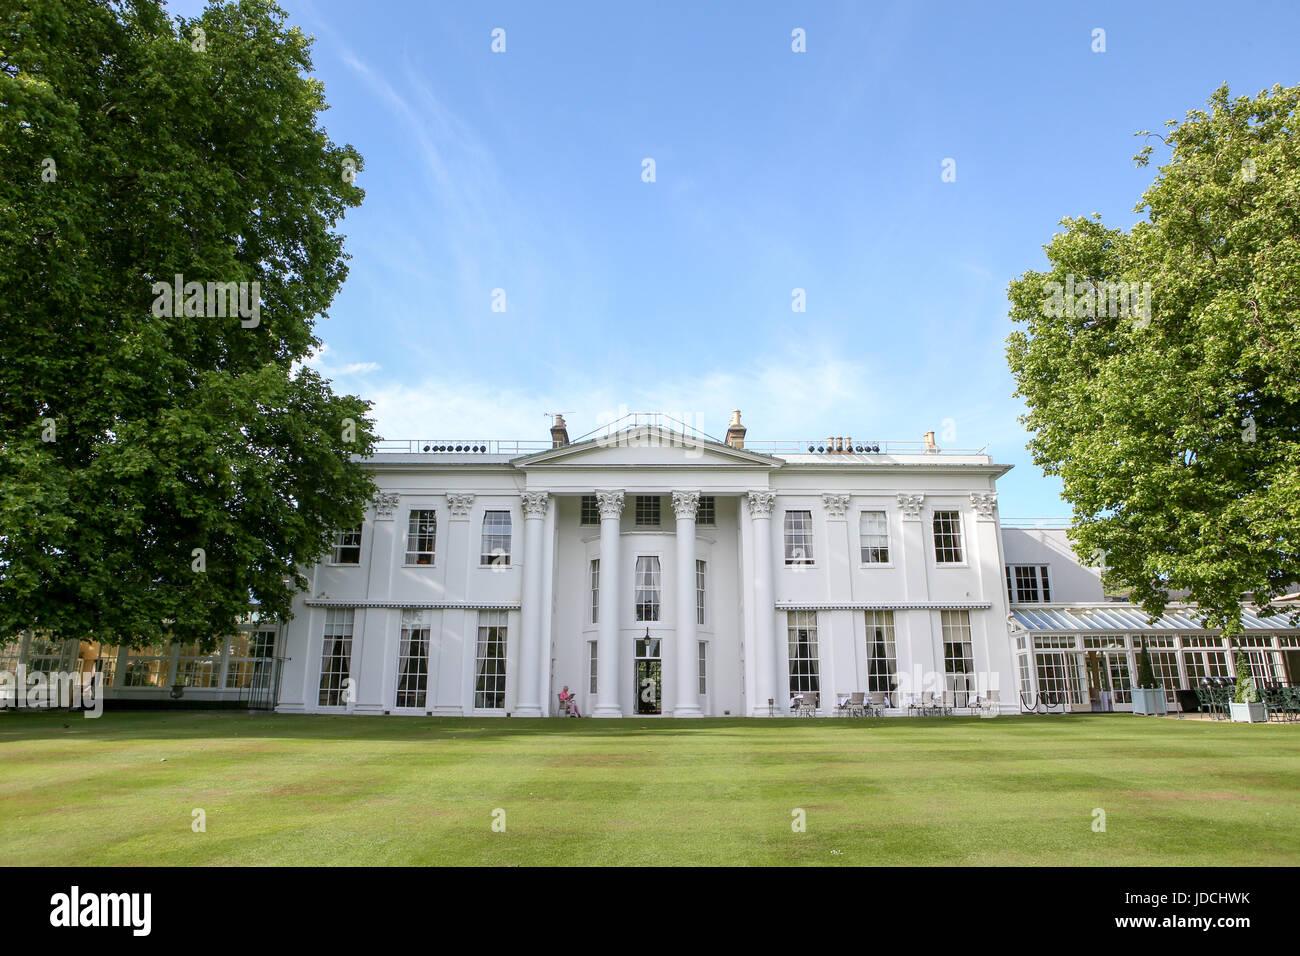 The Hurlingham Private Members Club, Fulham, London - Stock Image